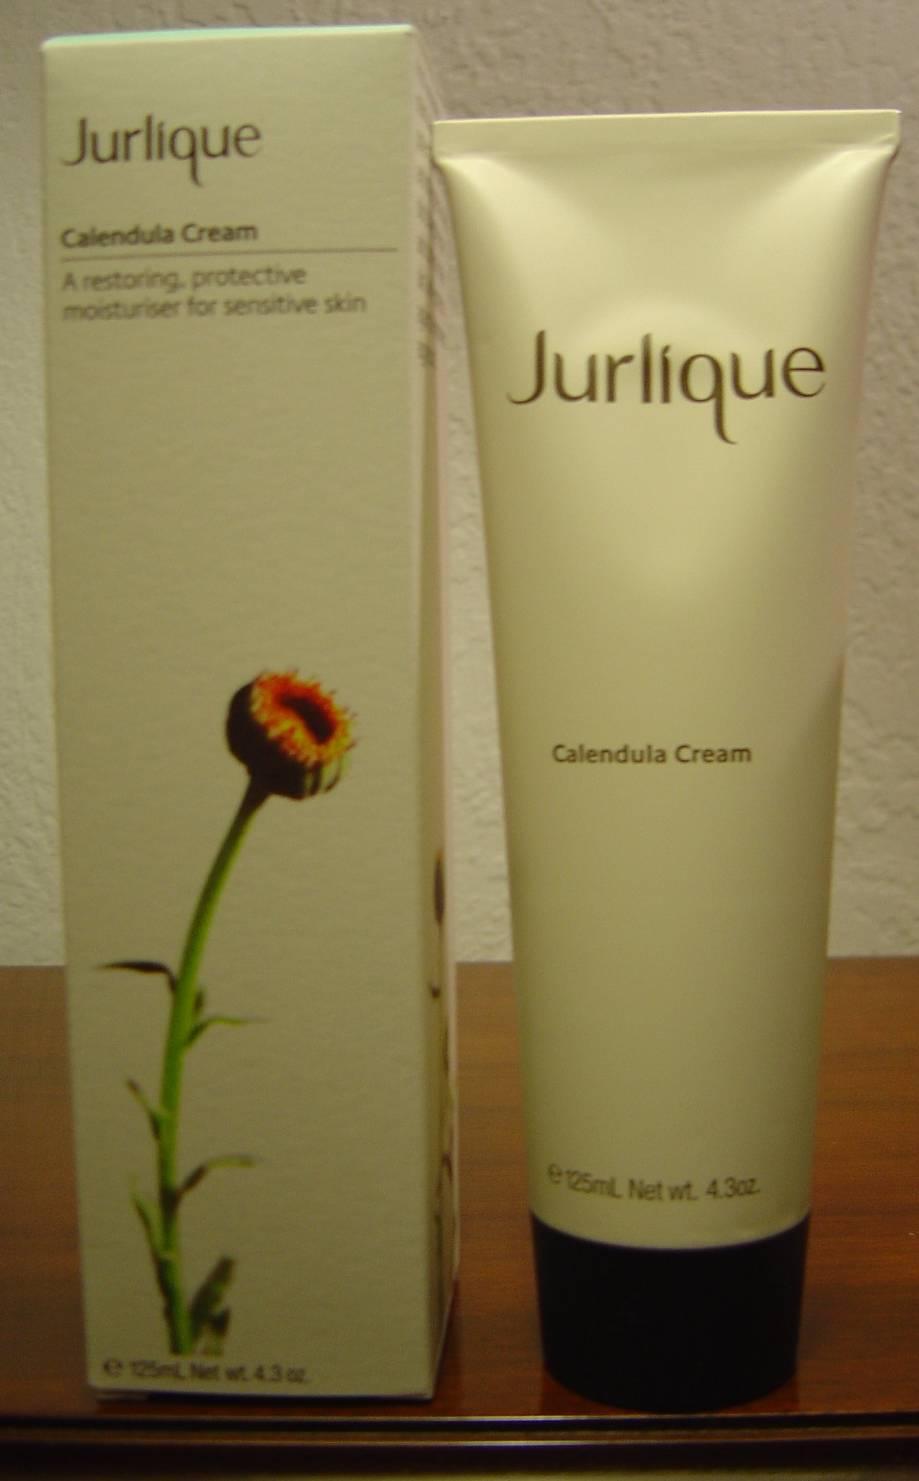 Jurlique's Calendula Cream.jpeg